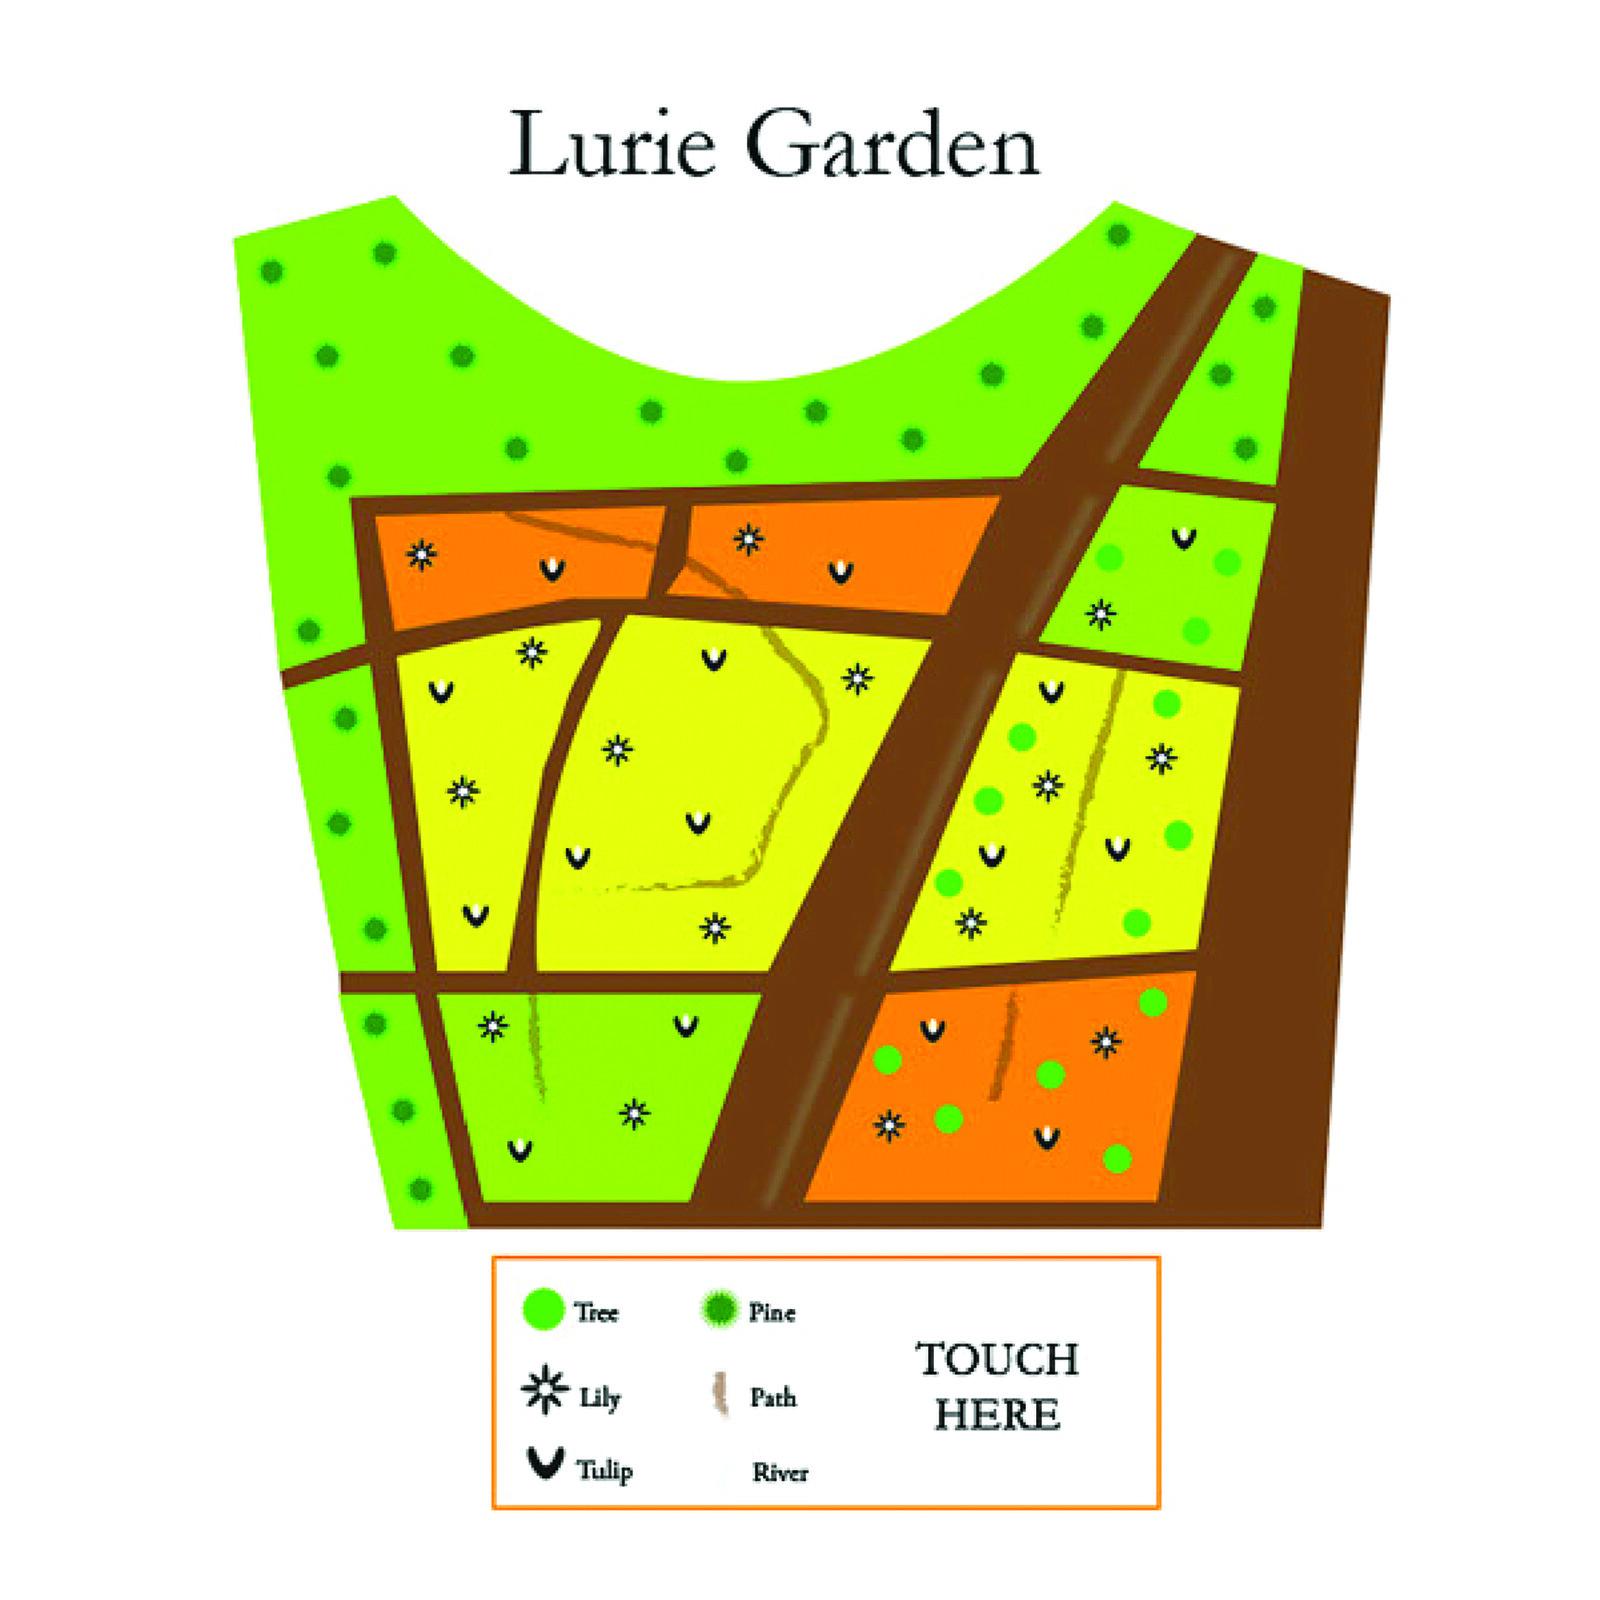 Lurie Garden